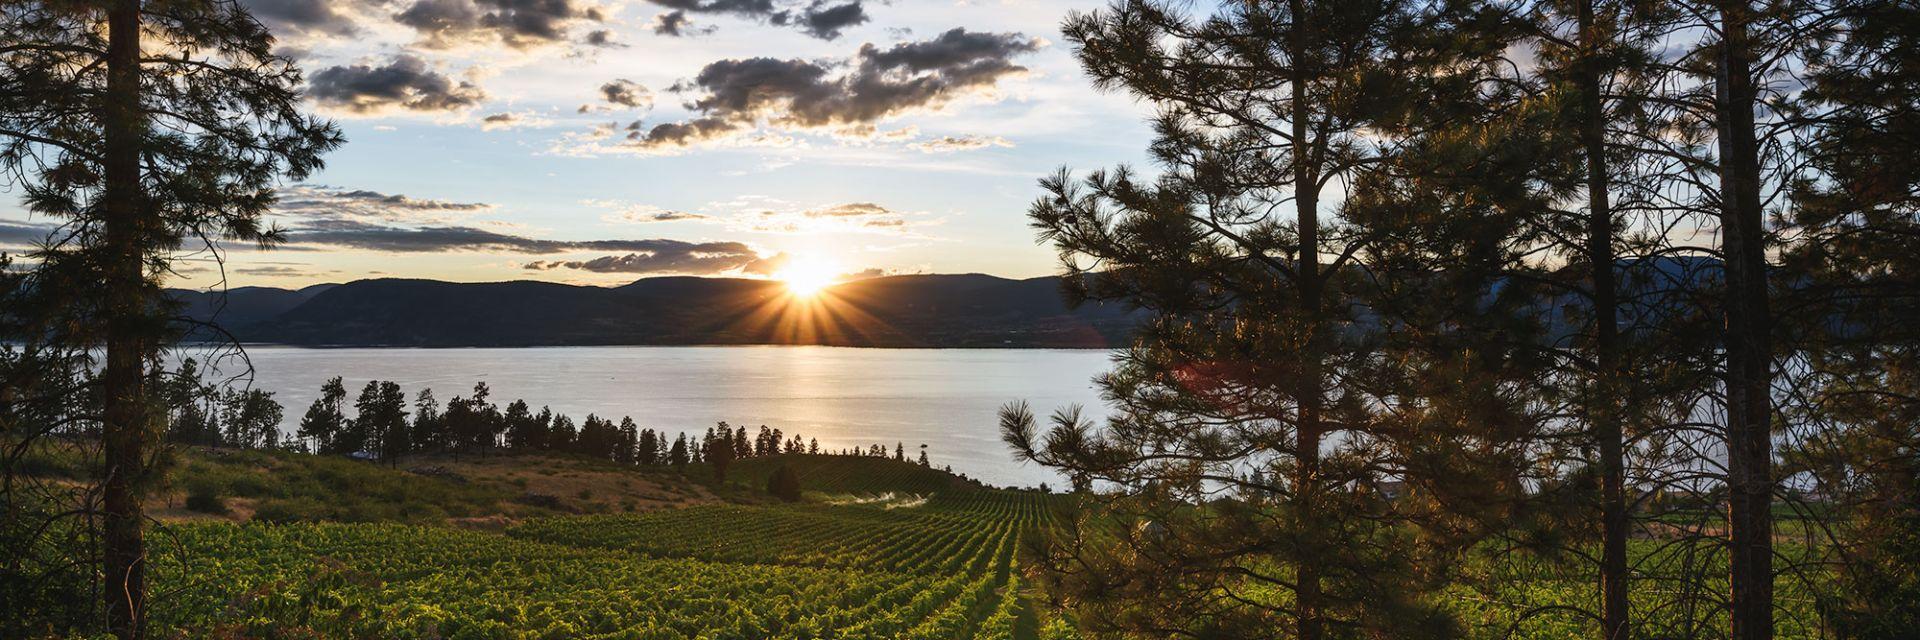 A sunrise over a lake in British Columbia